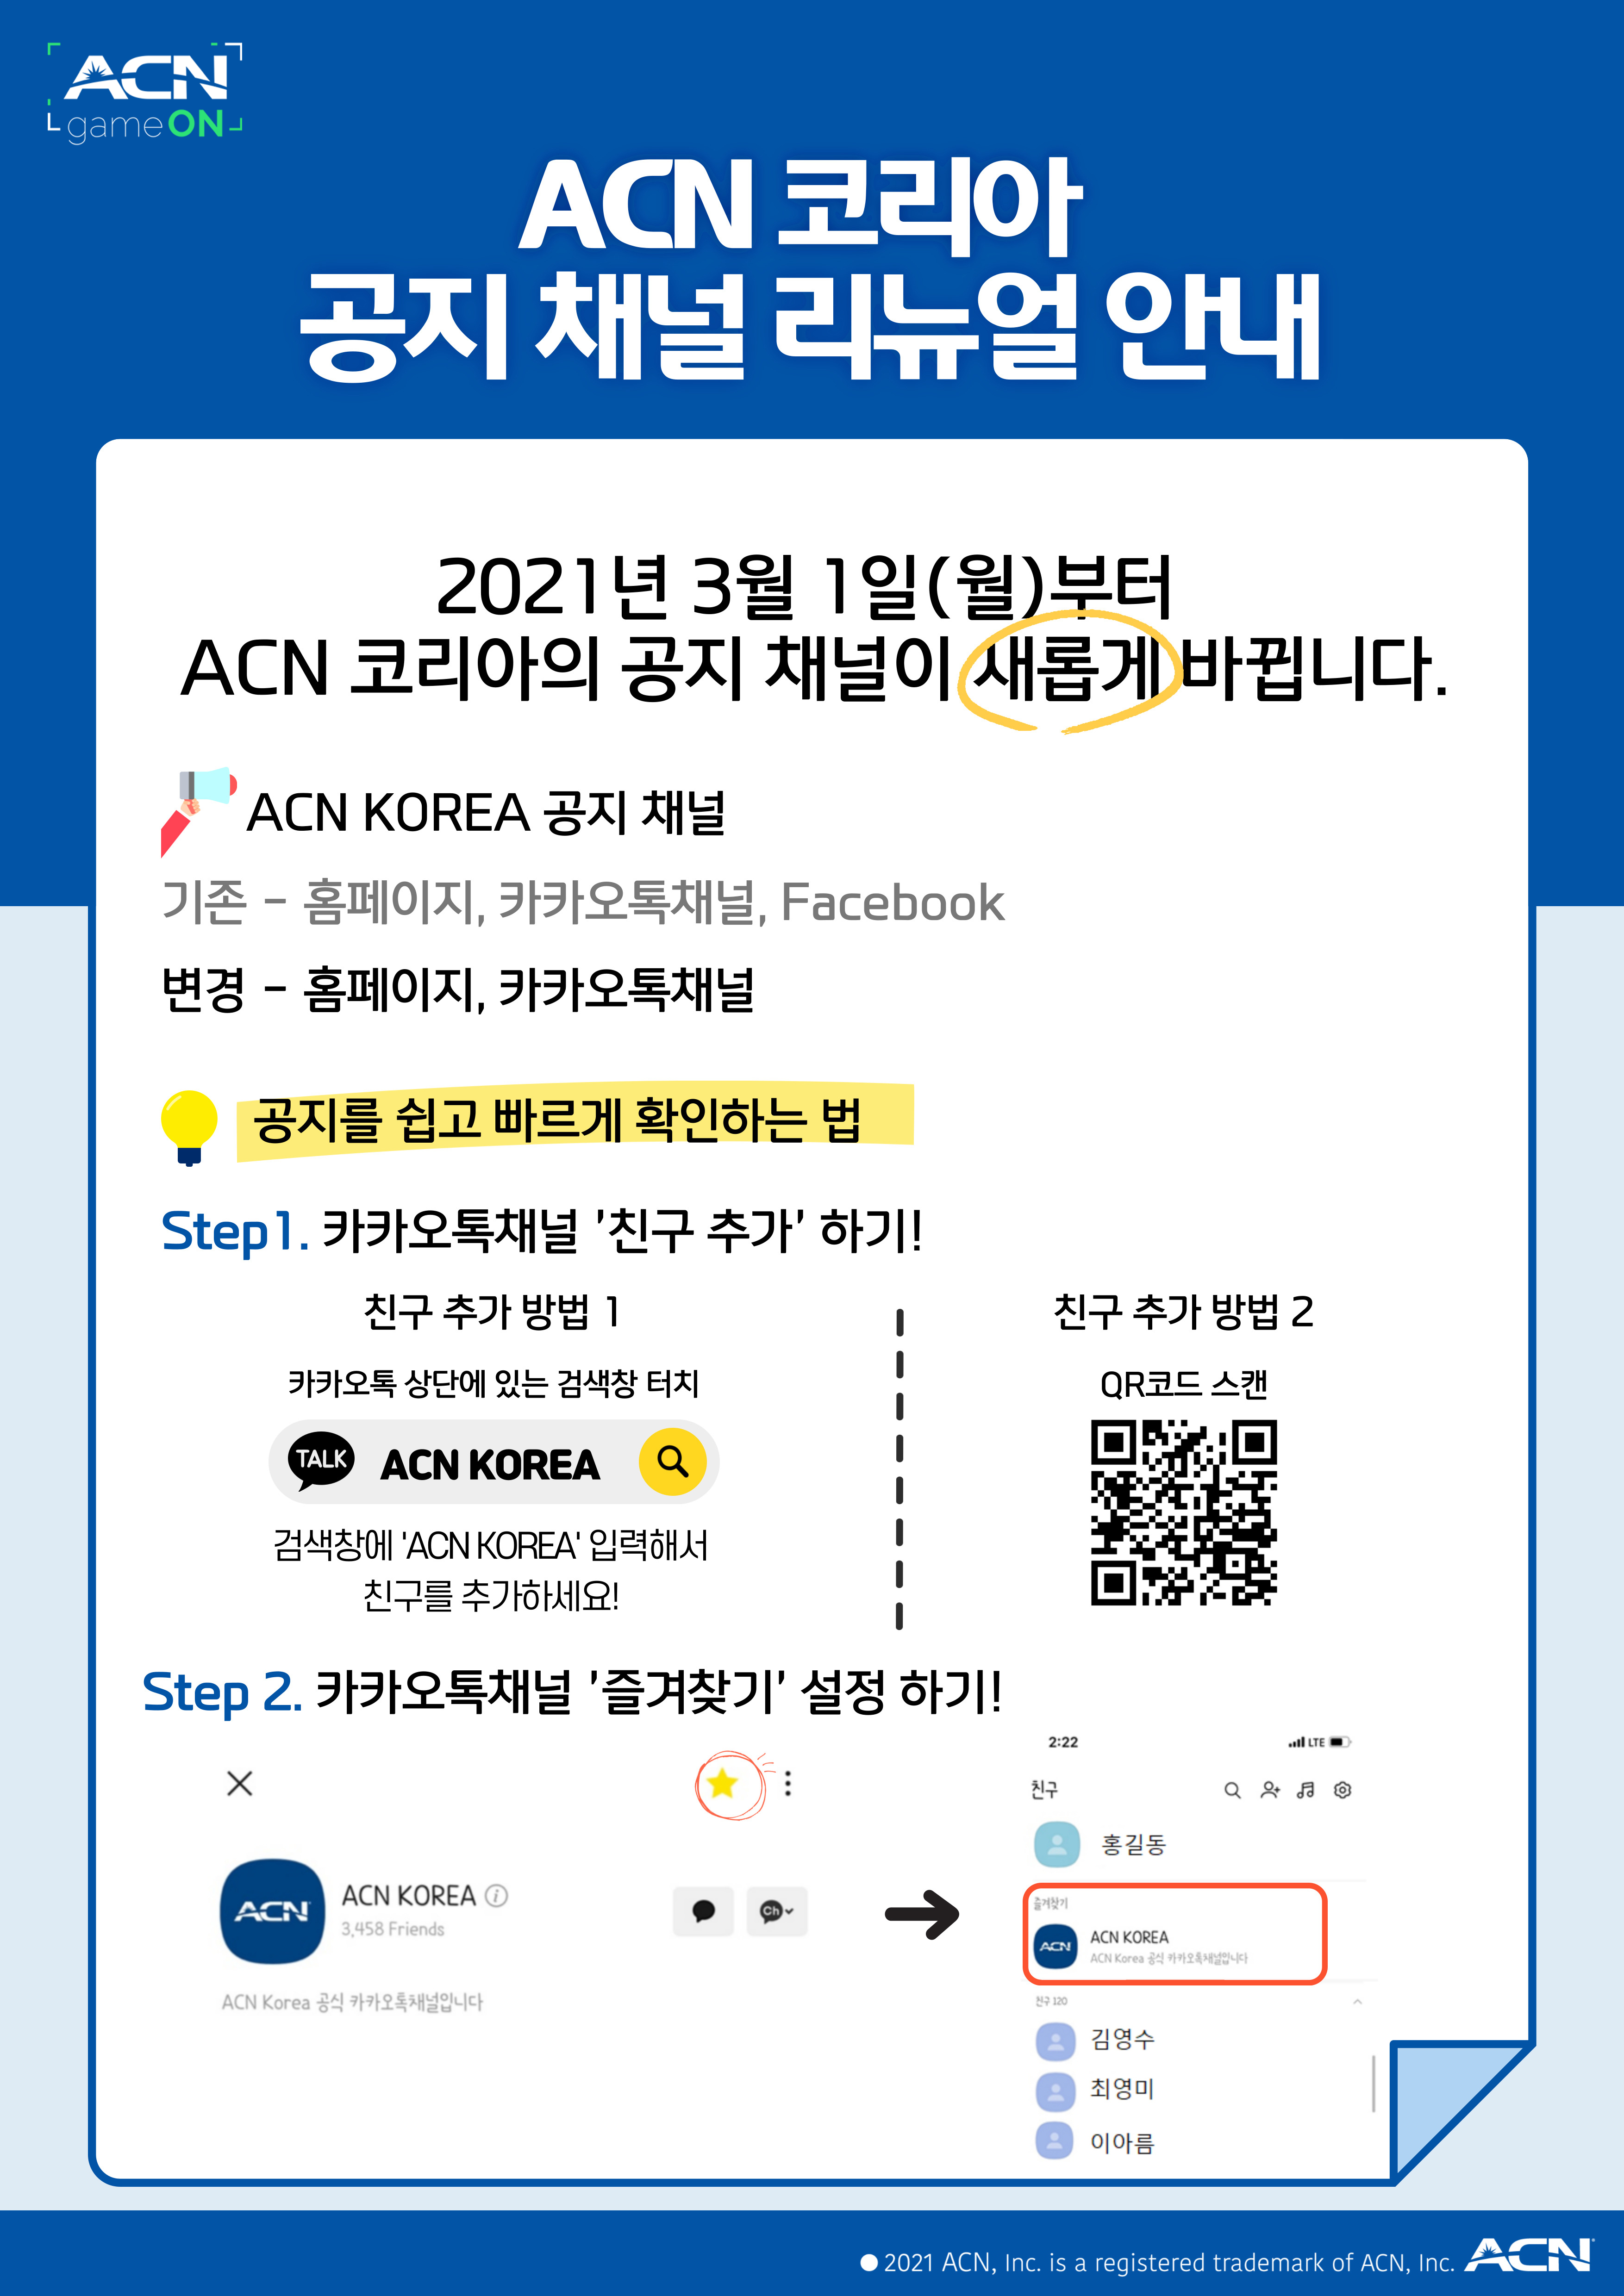 ACN 코리아 공지 채널 리뉴얼 안내